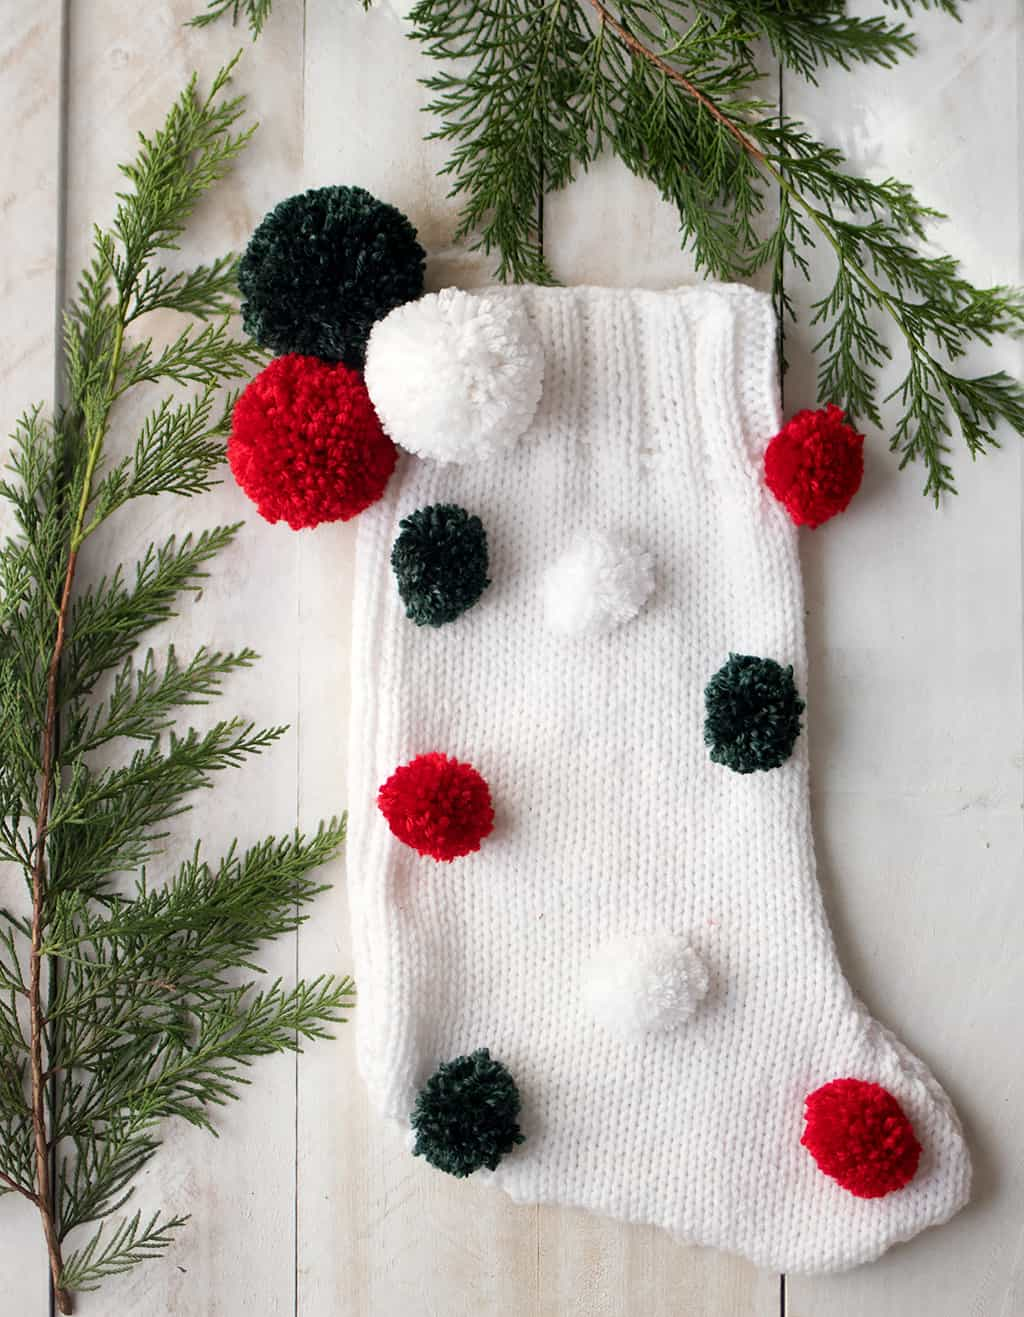 Easy Knit Christmas Stocking Pattern - Gina Michele